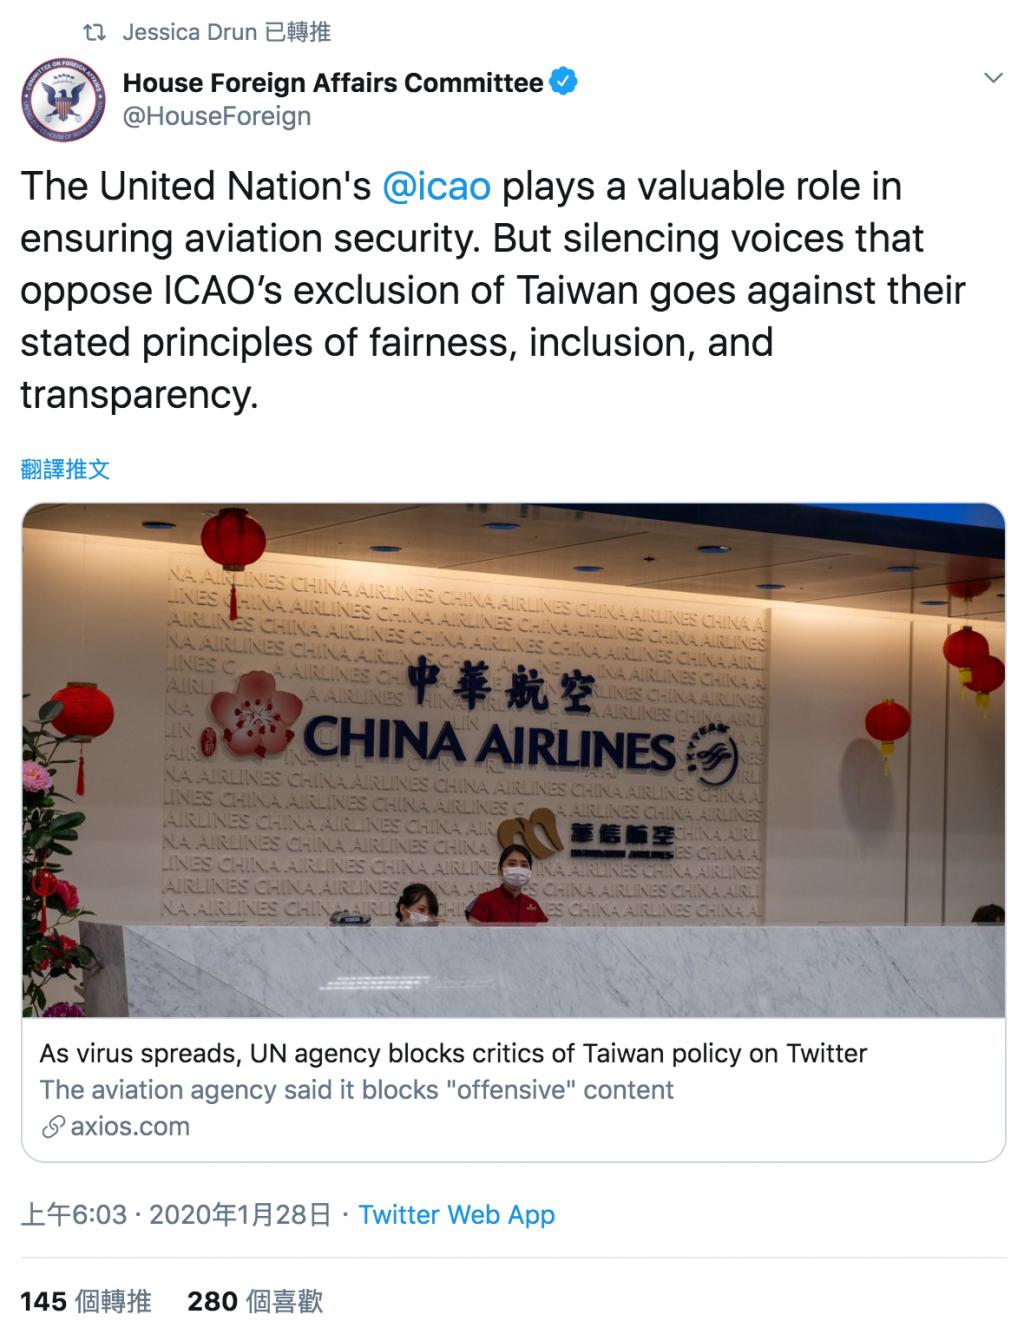 UN's aviation agency blocks Twitter accounts mentioning 'Taiwan'